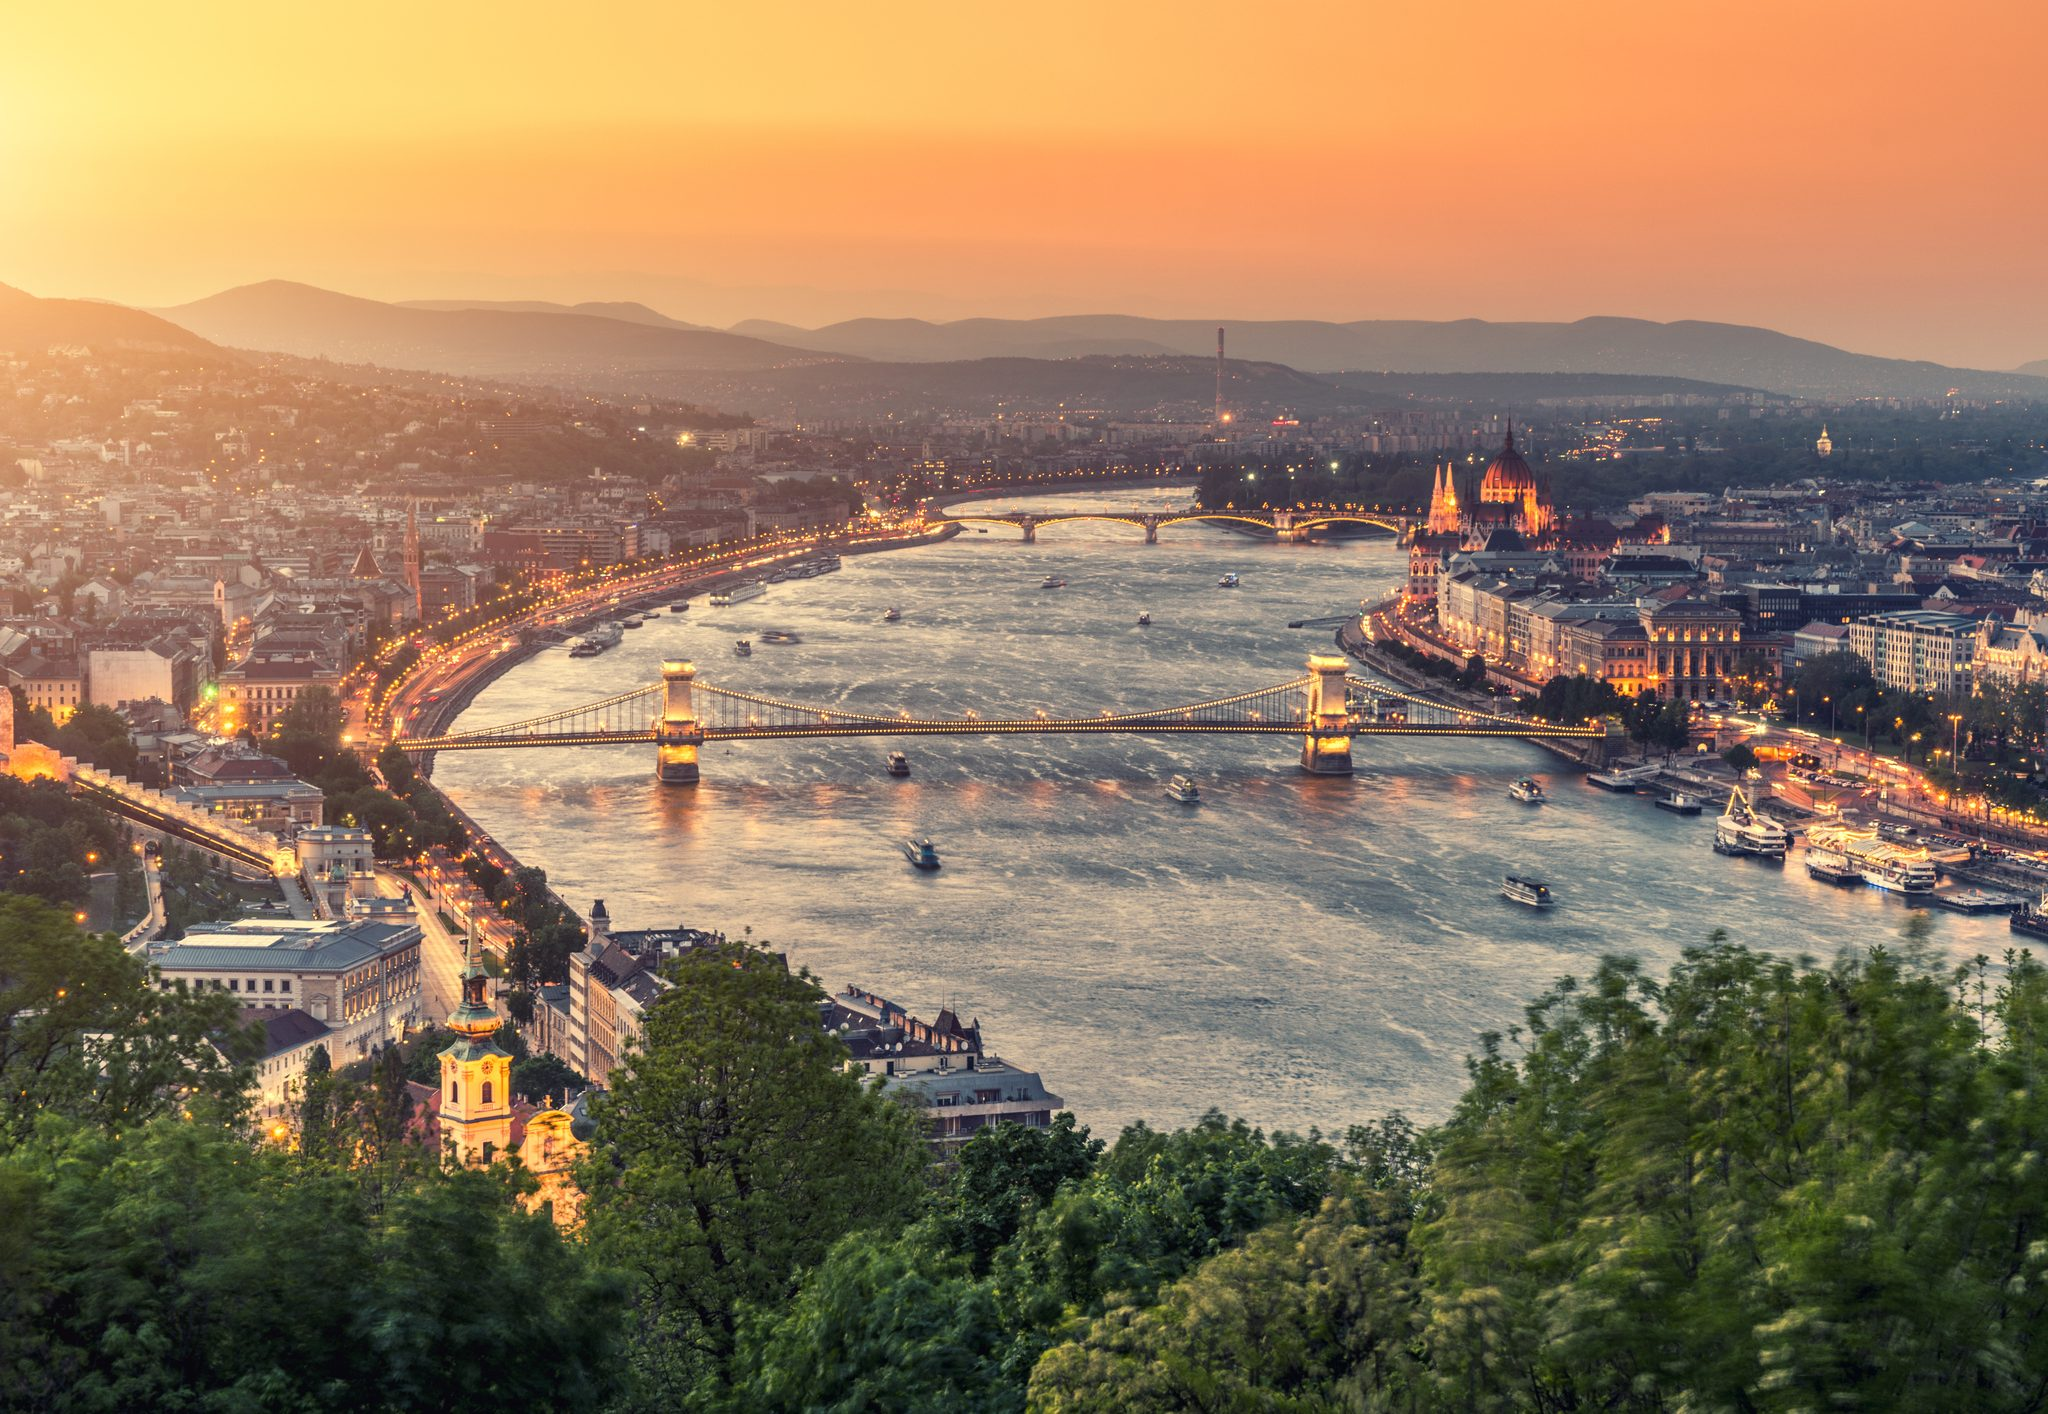 PLATINA3 wil Europese binnenvaart stimuleren. (Stockfoto)